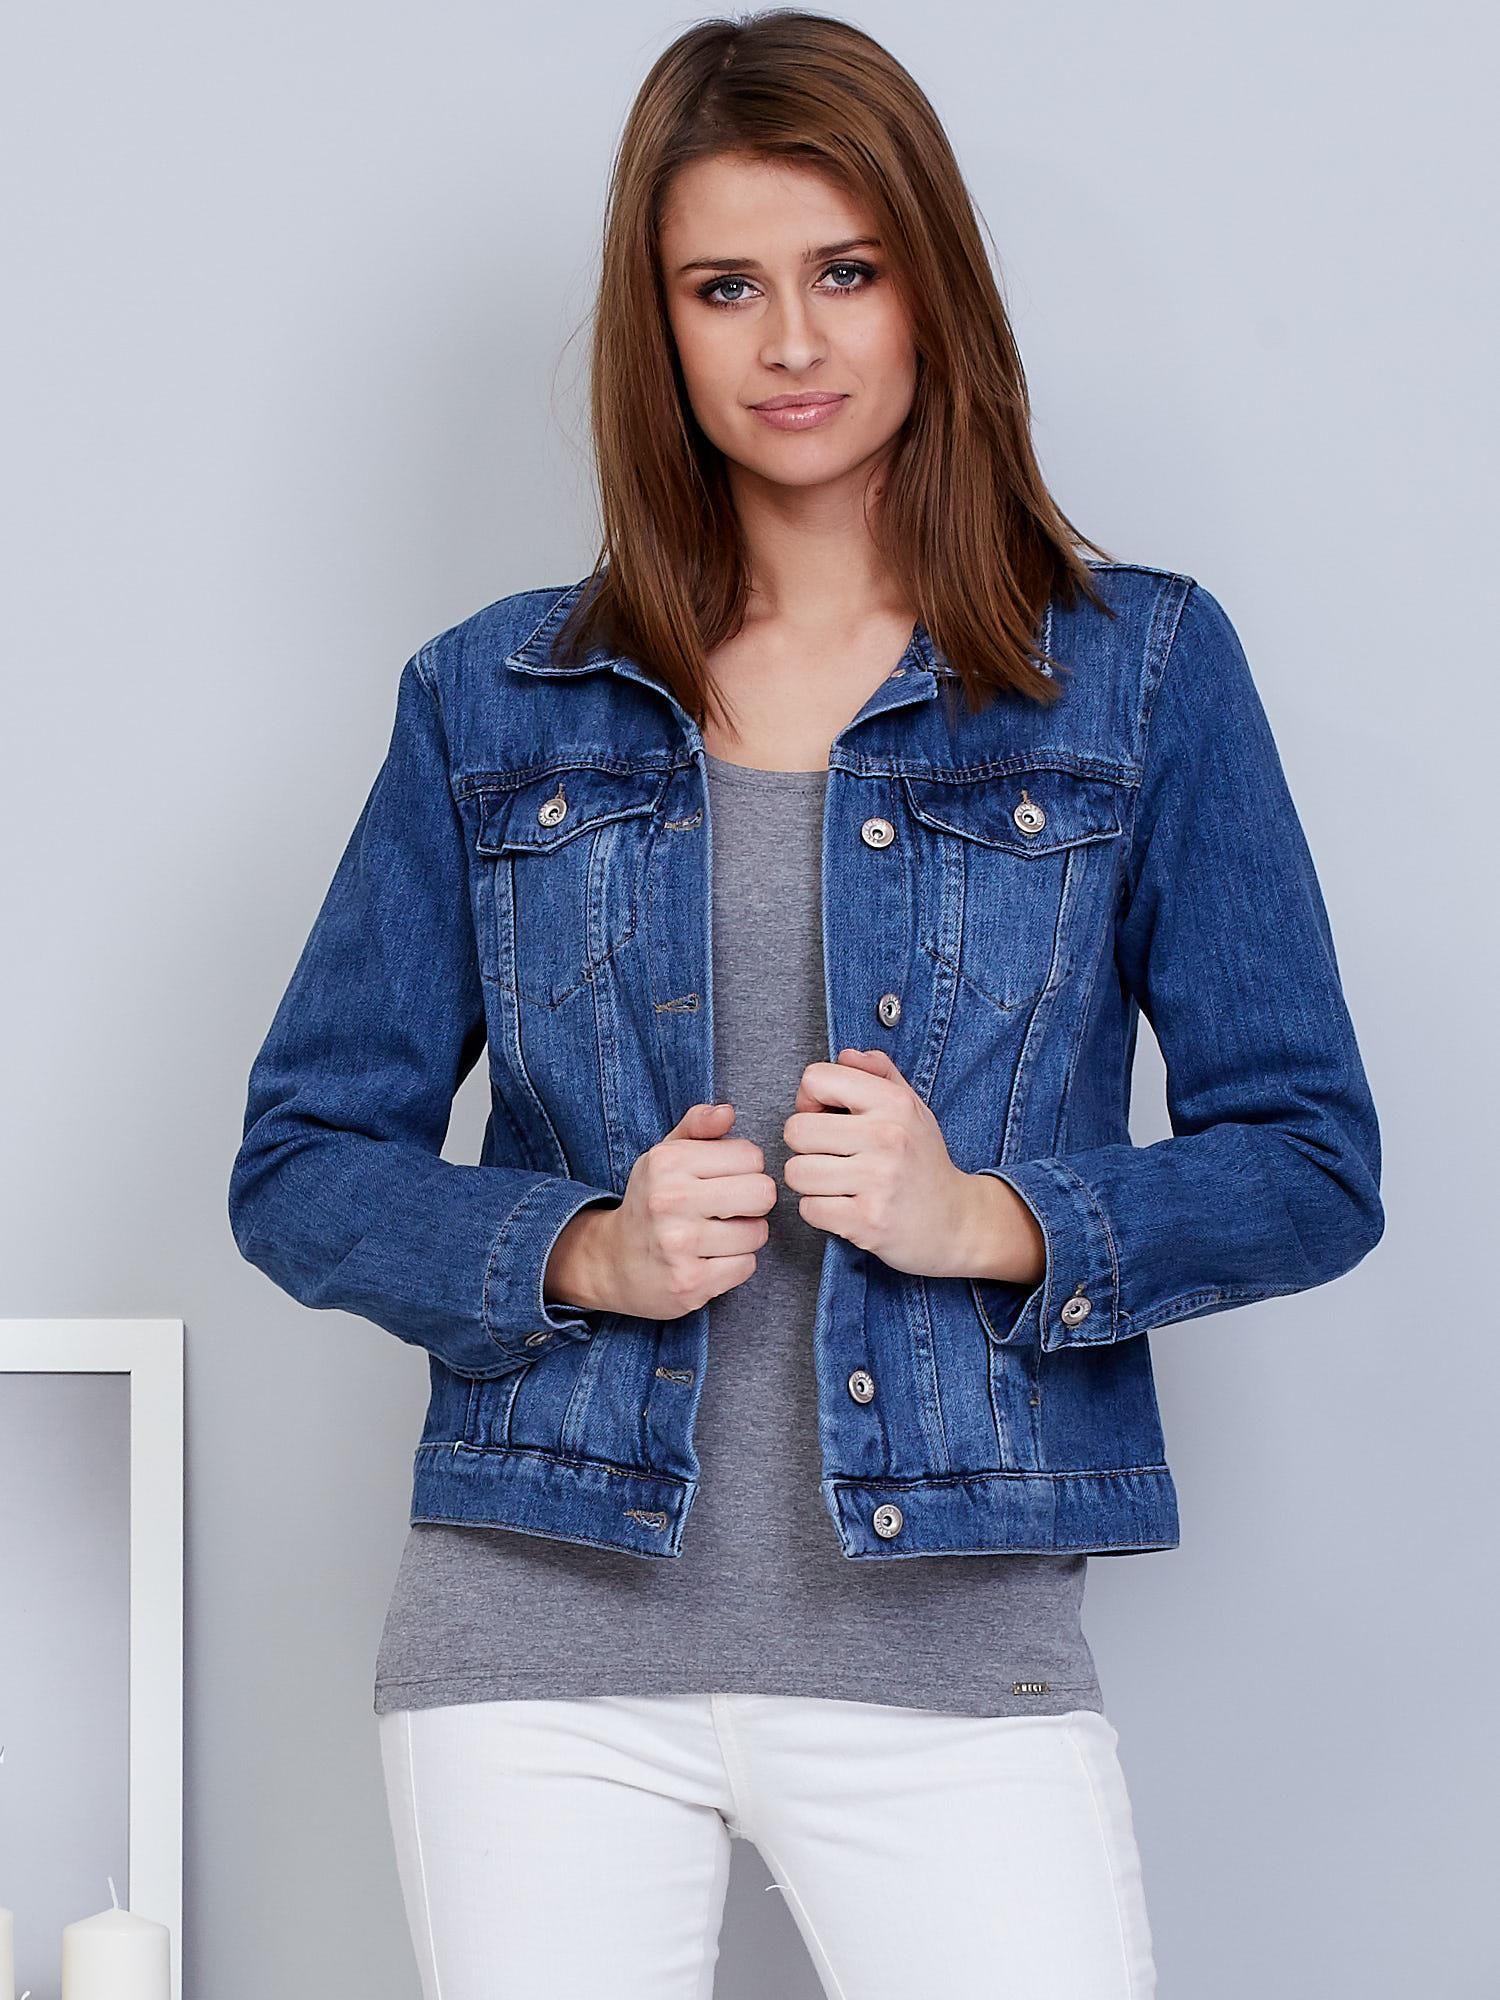 cf638ecdc0427 Kurtka damska jeansowa niebieska - Kurtka jeansowa - sklep eButik.pl